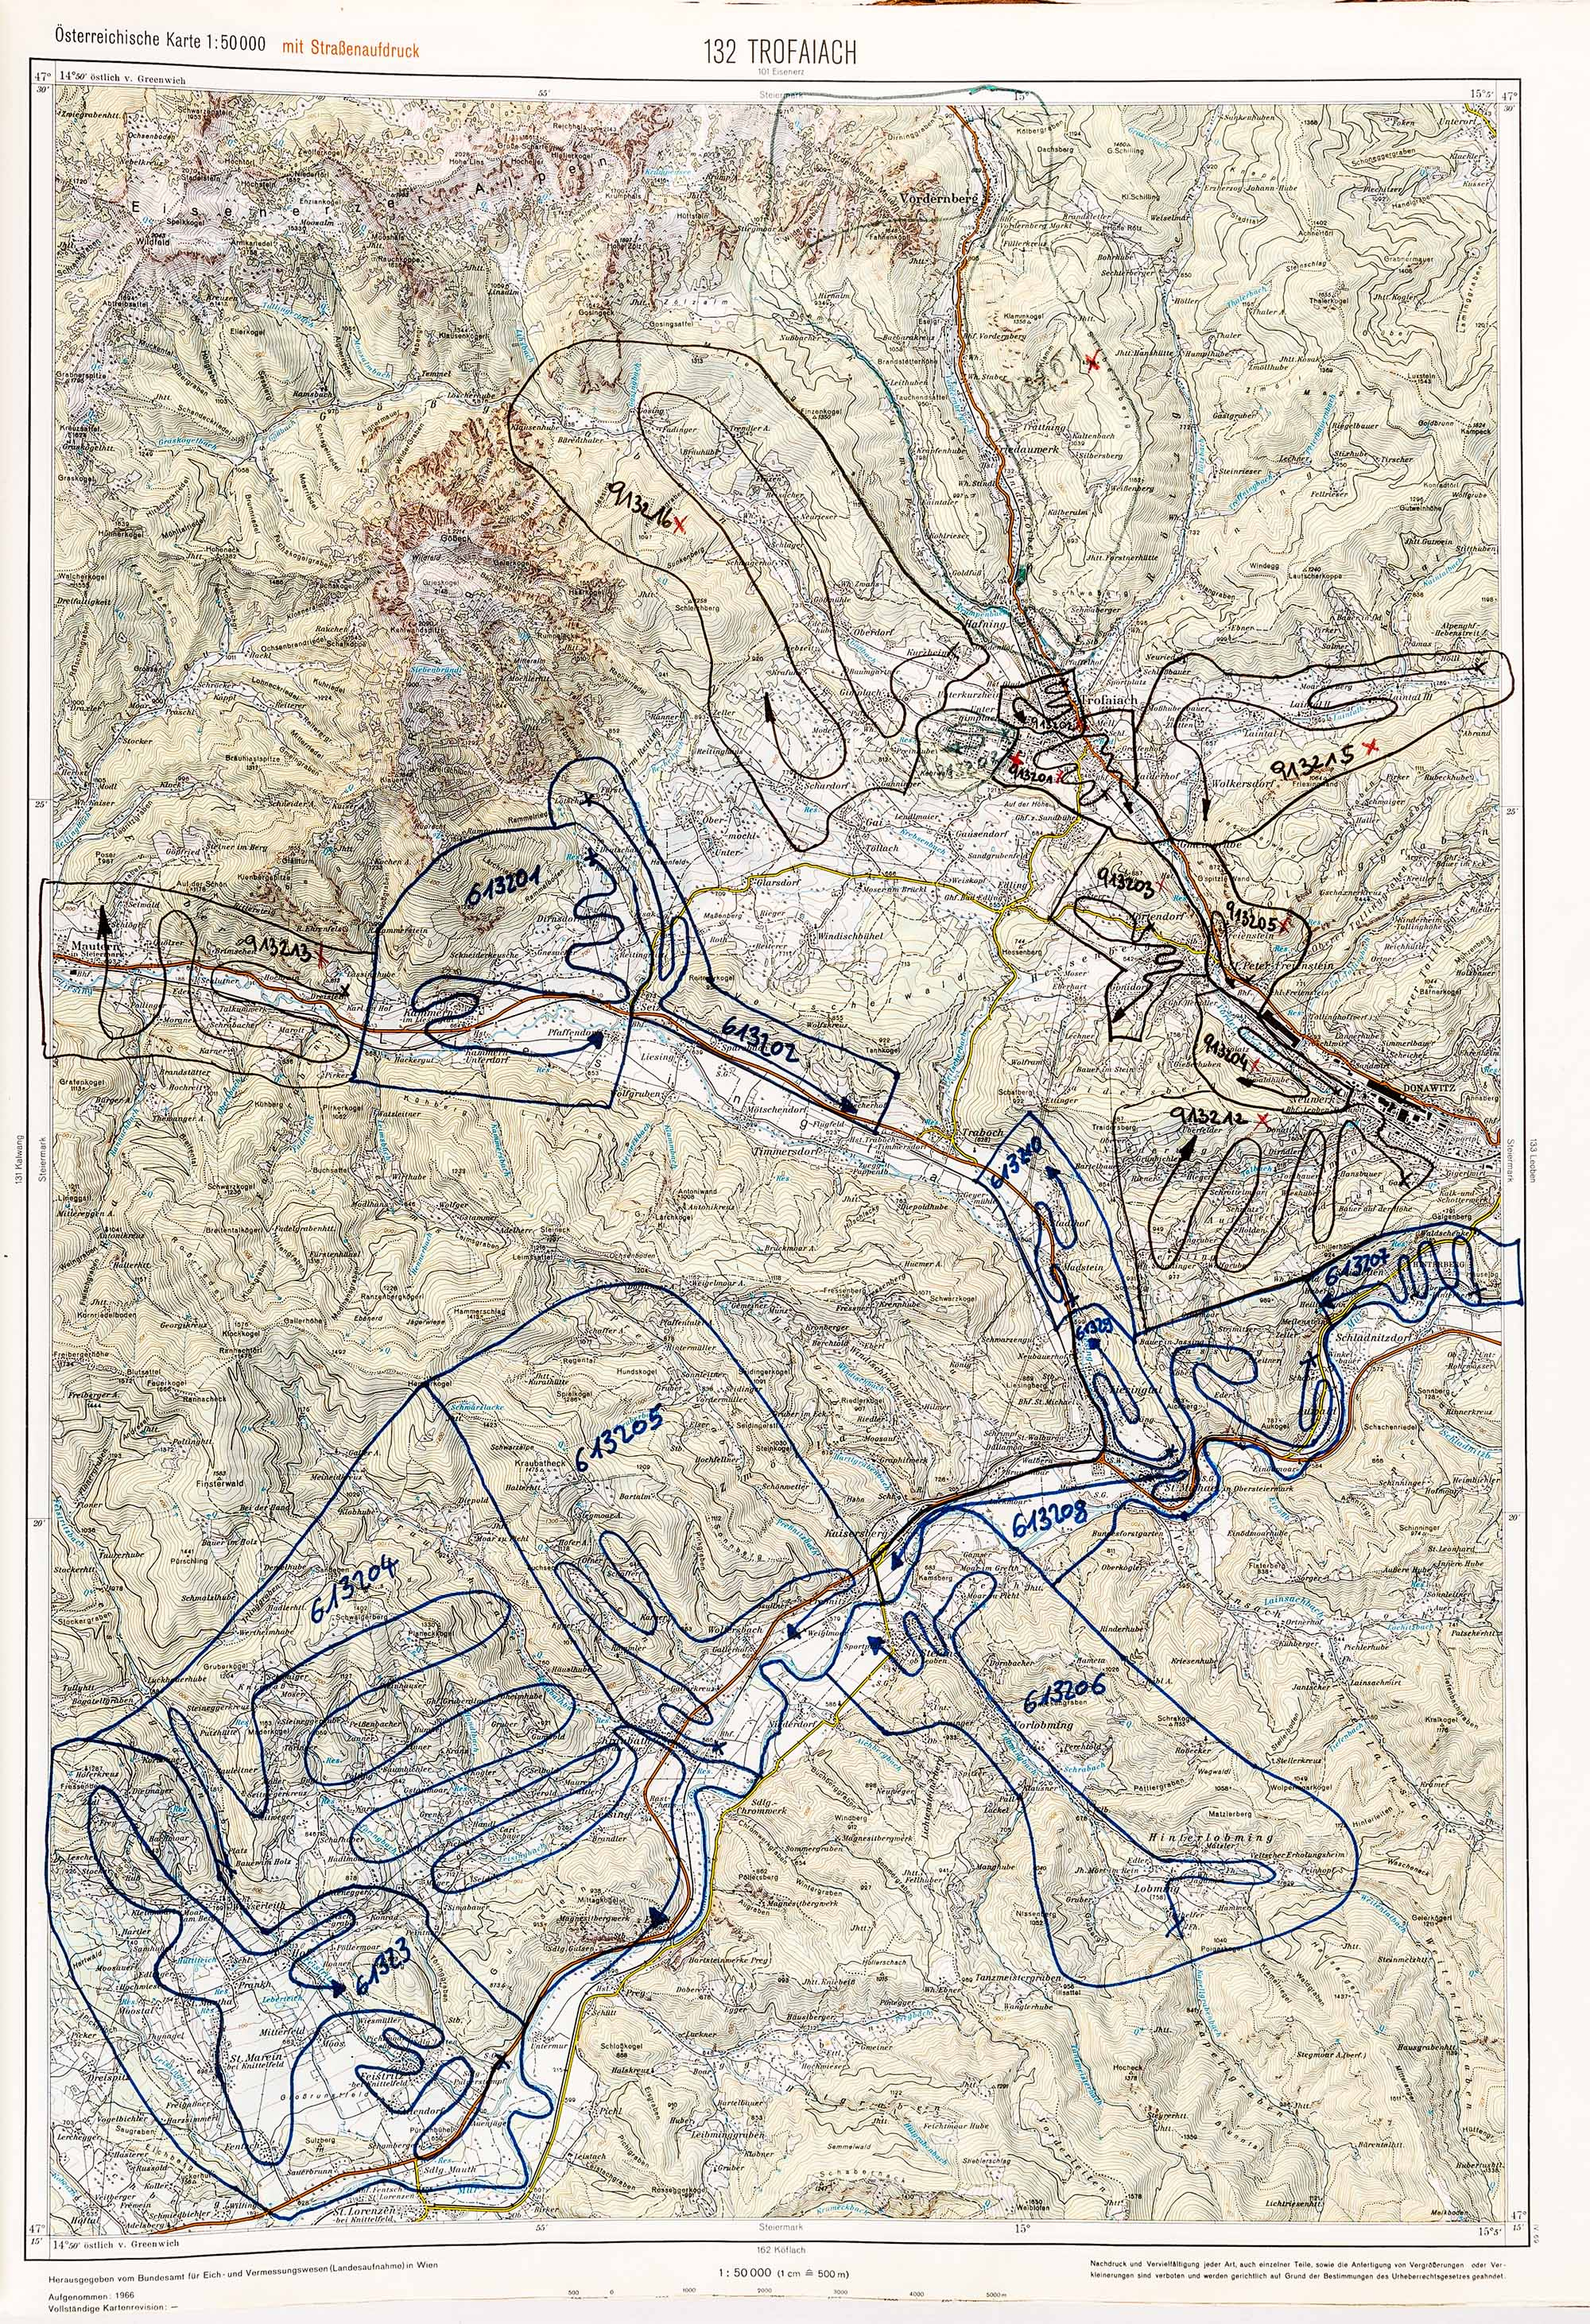 1975-1979 Karte 132